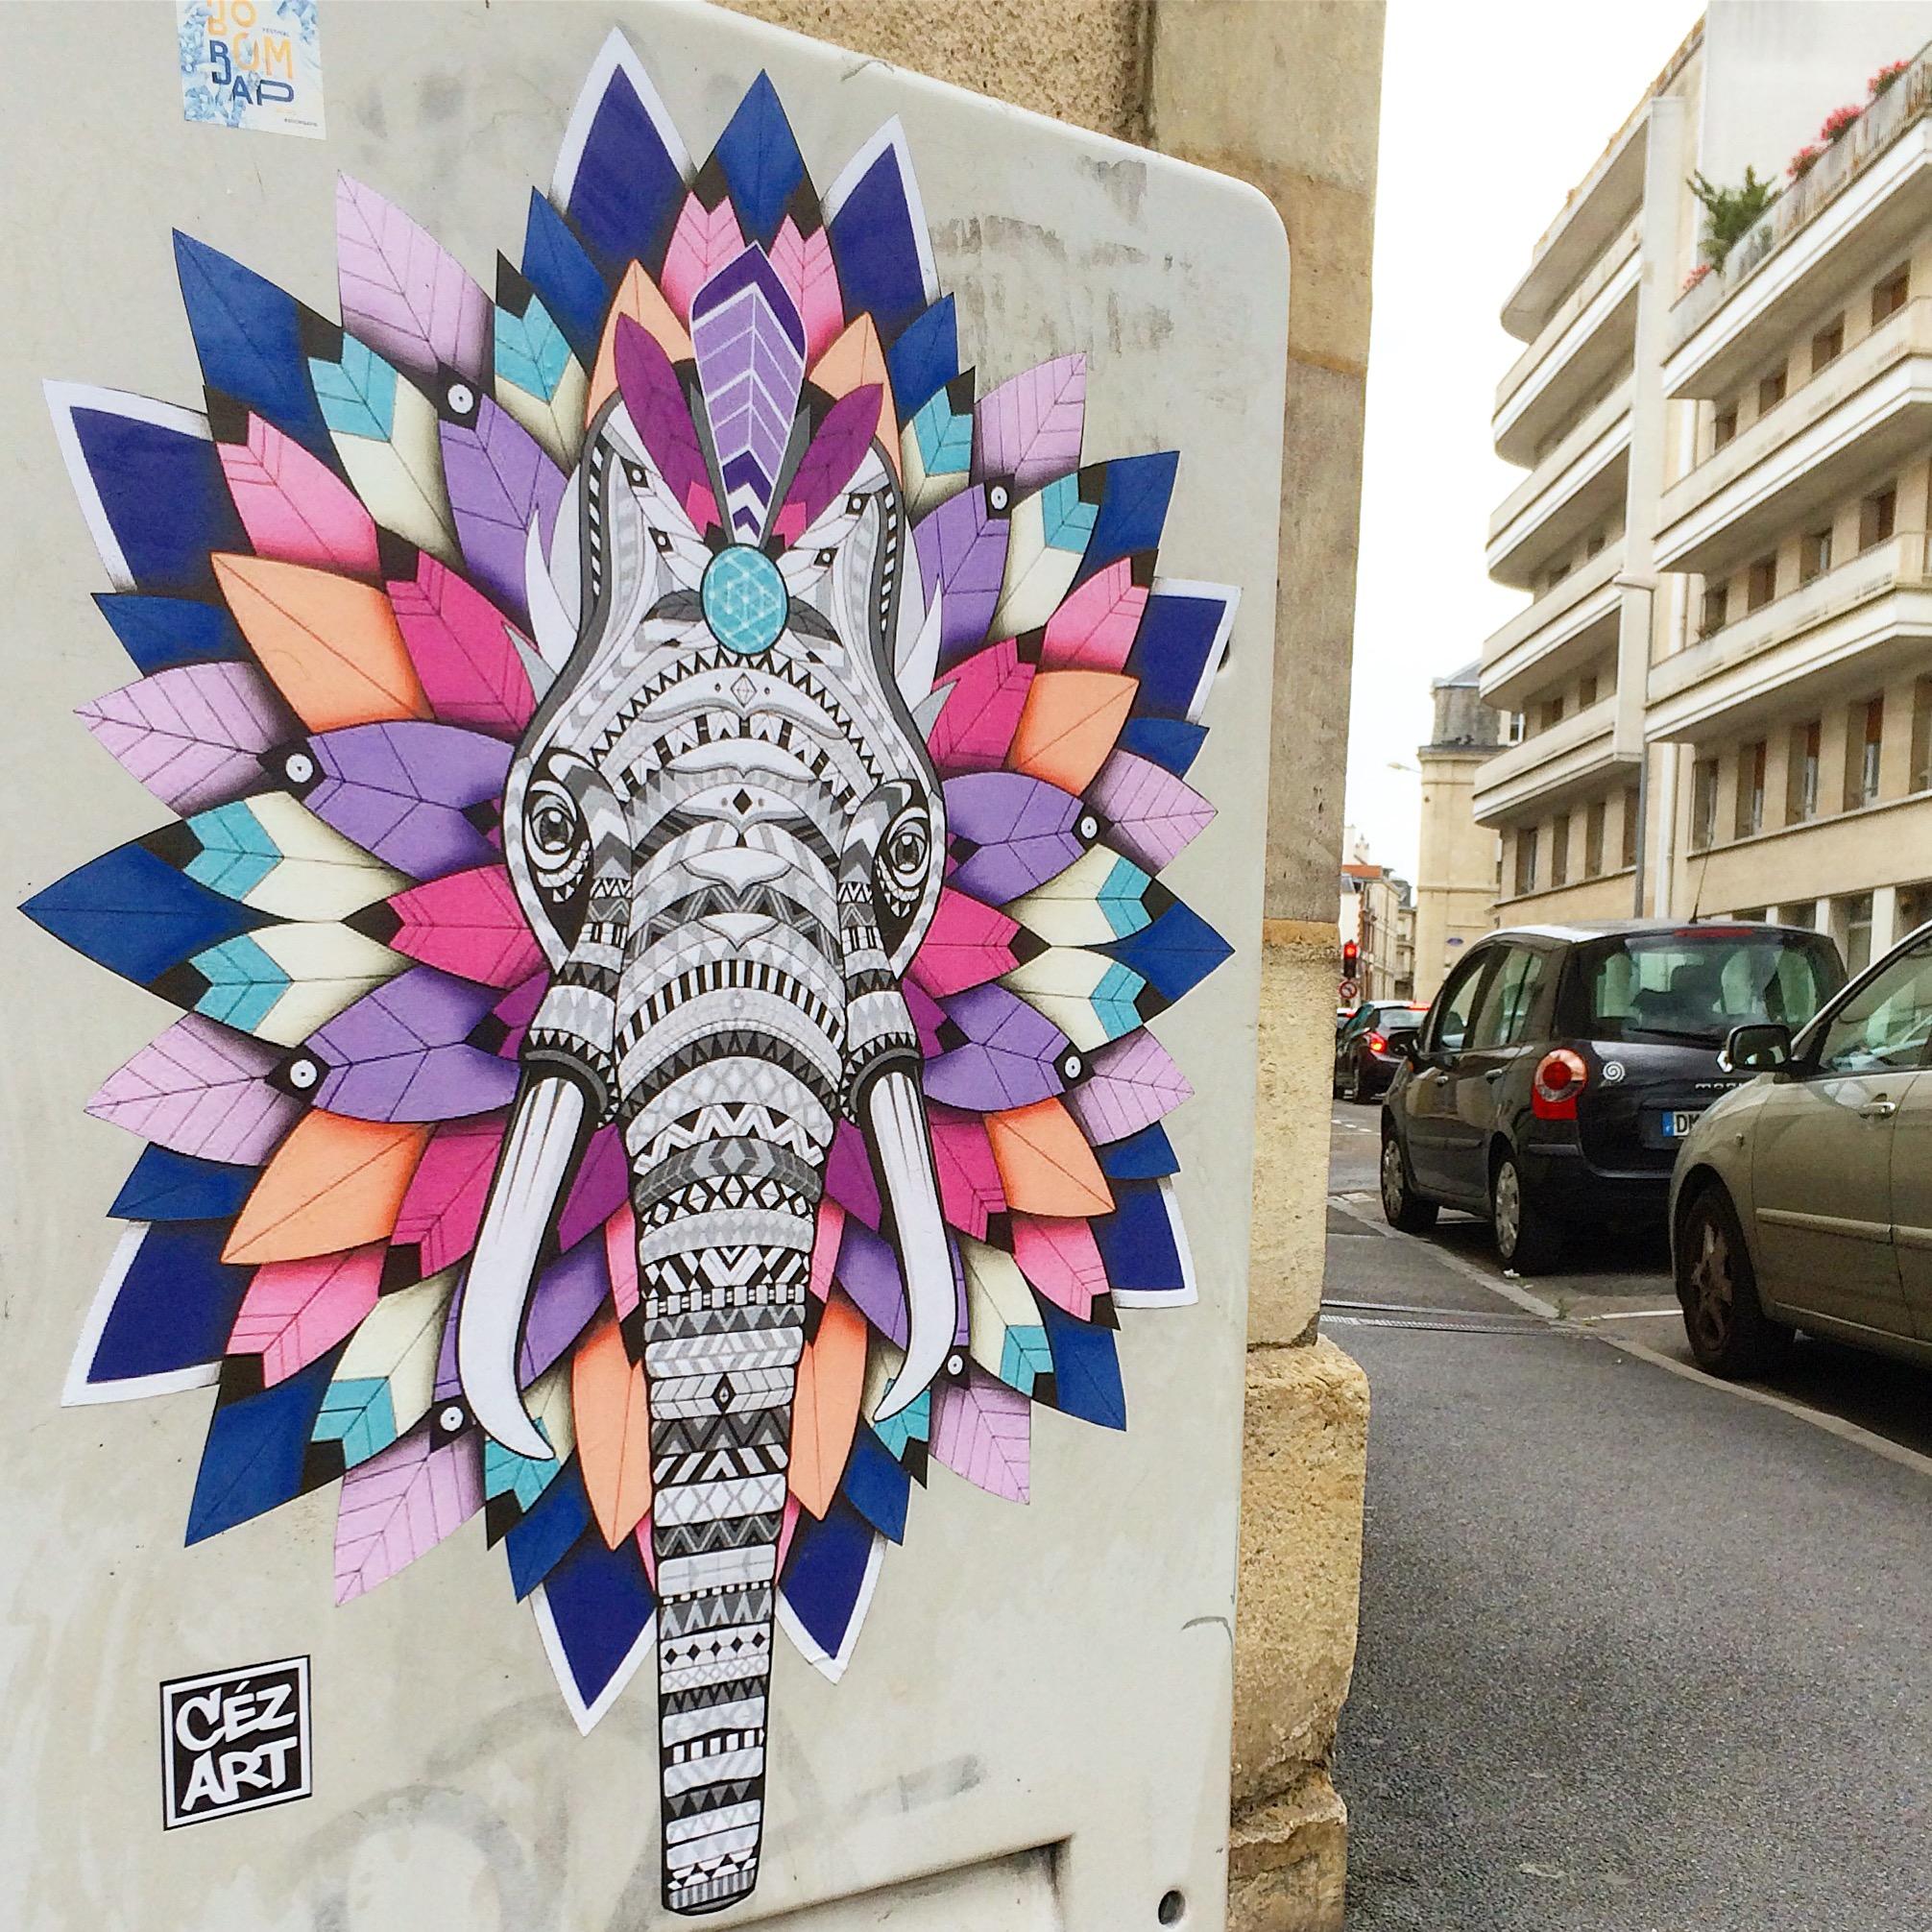 Collage Reims 2016